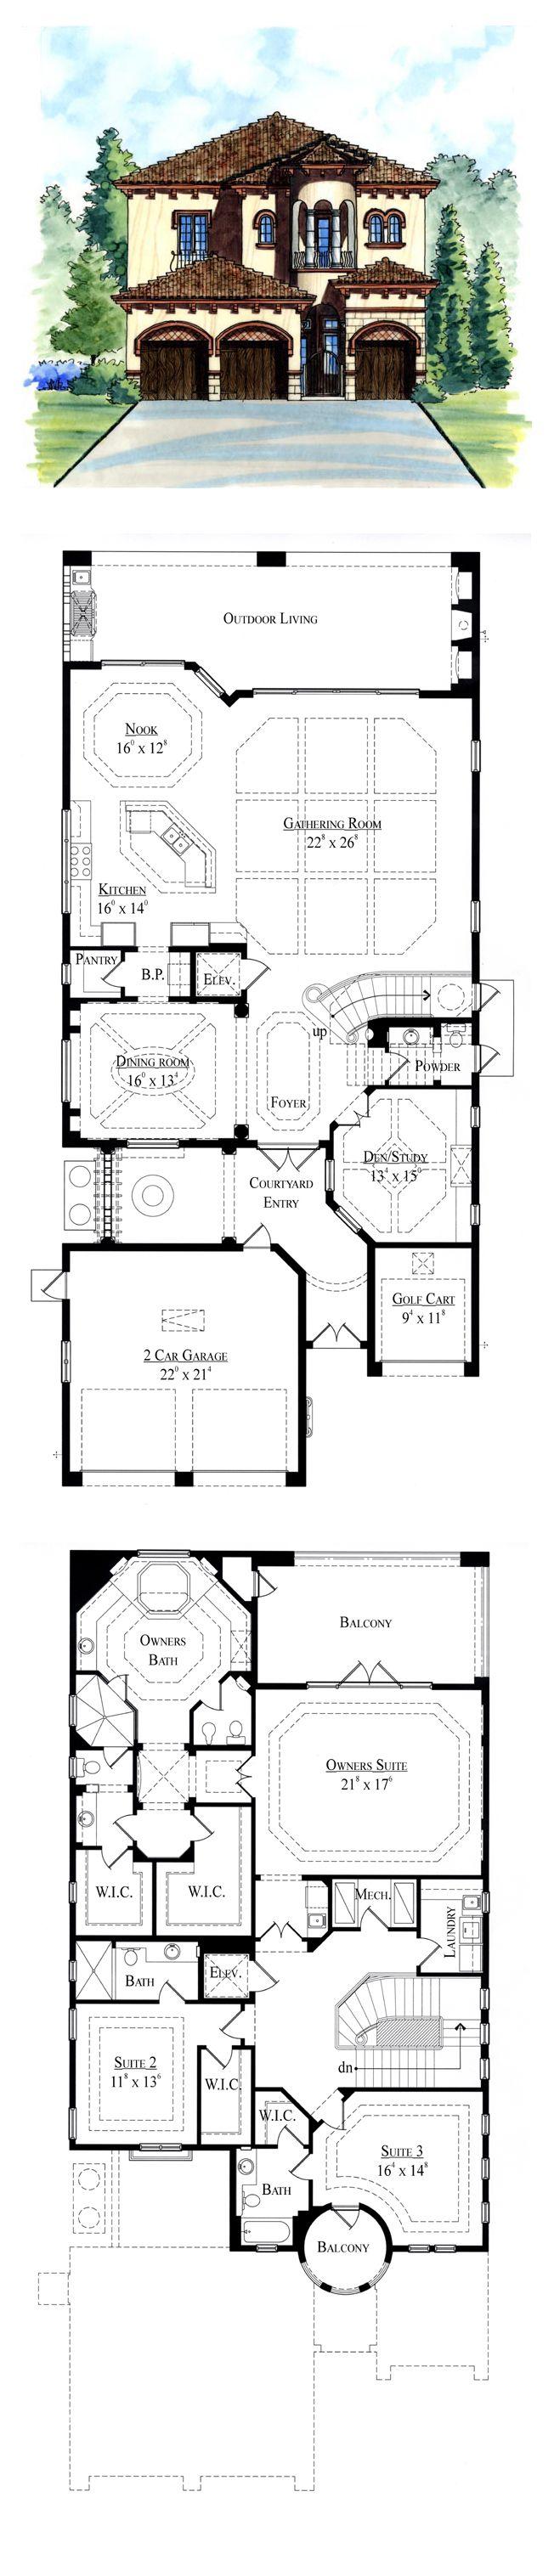 Italian House Plan 74283 | Total Living Area: 3979 sq. ft., 3 bedrooms & 3.5 bathrooms. #houseplan #italianstyle